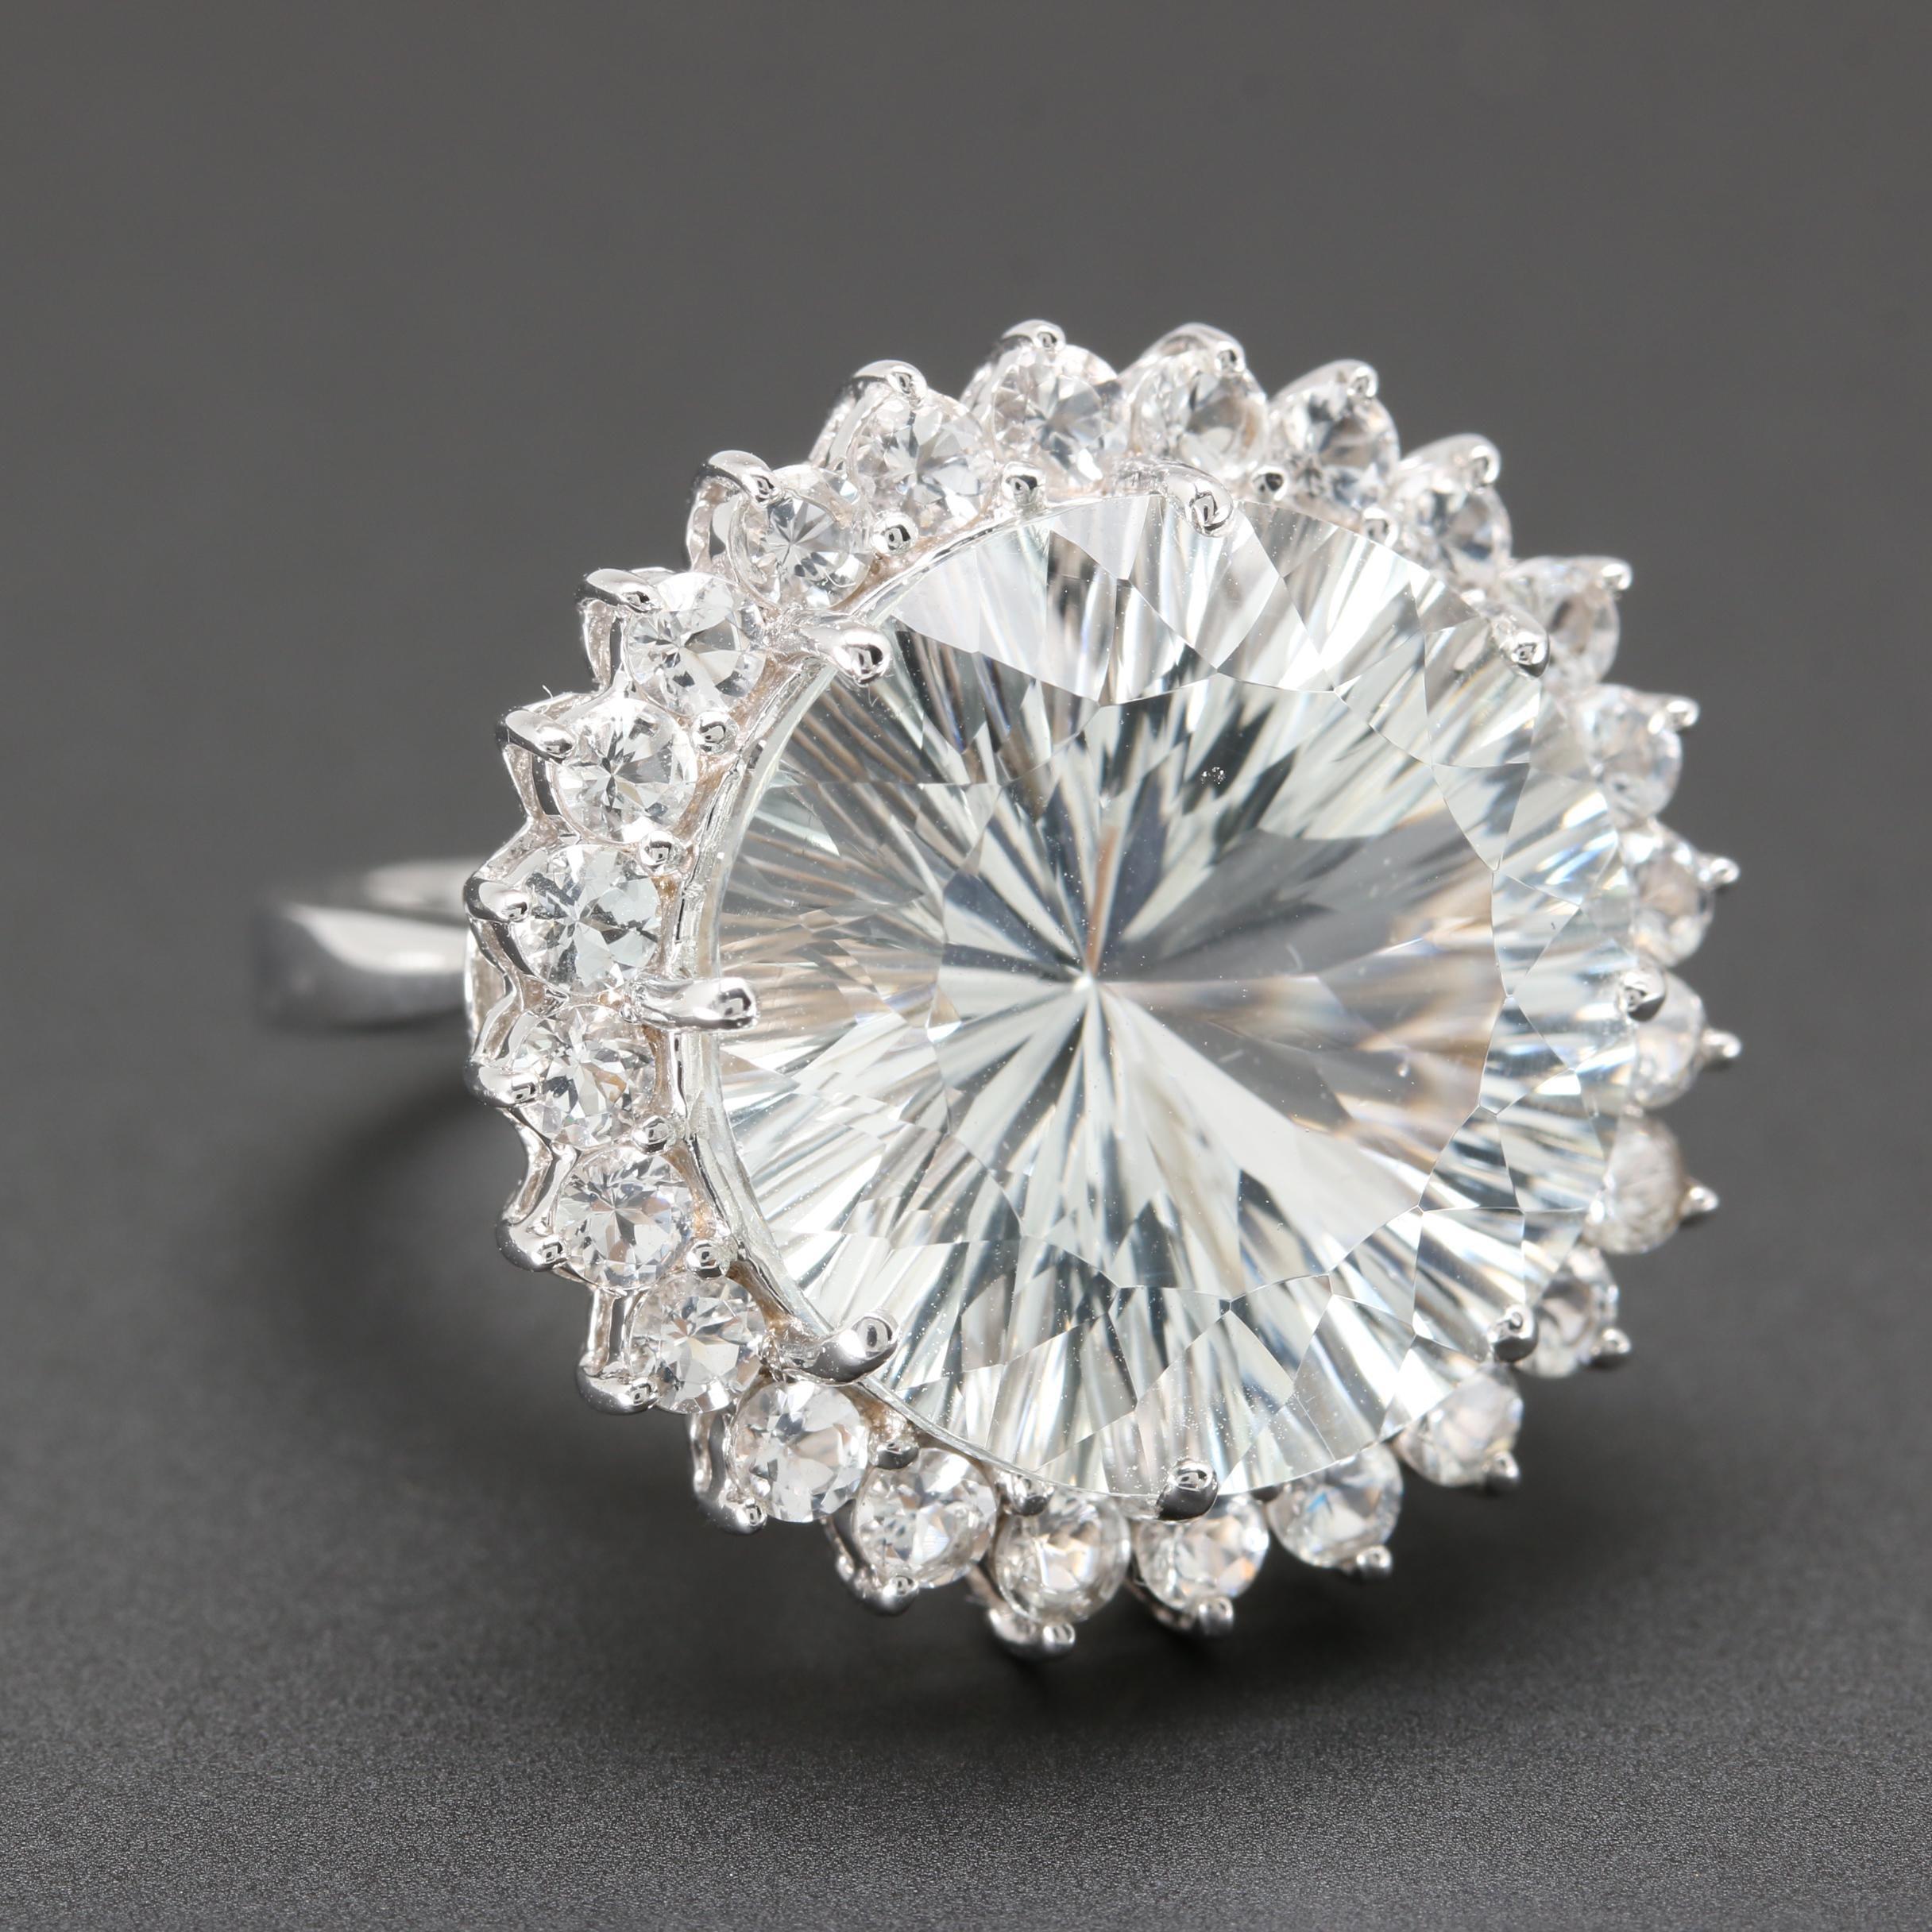 14K White Gold White Topaz Ring